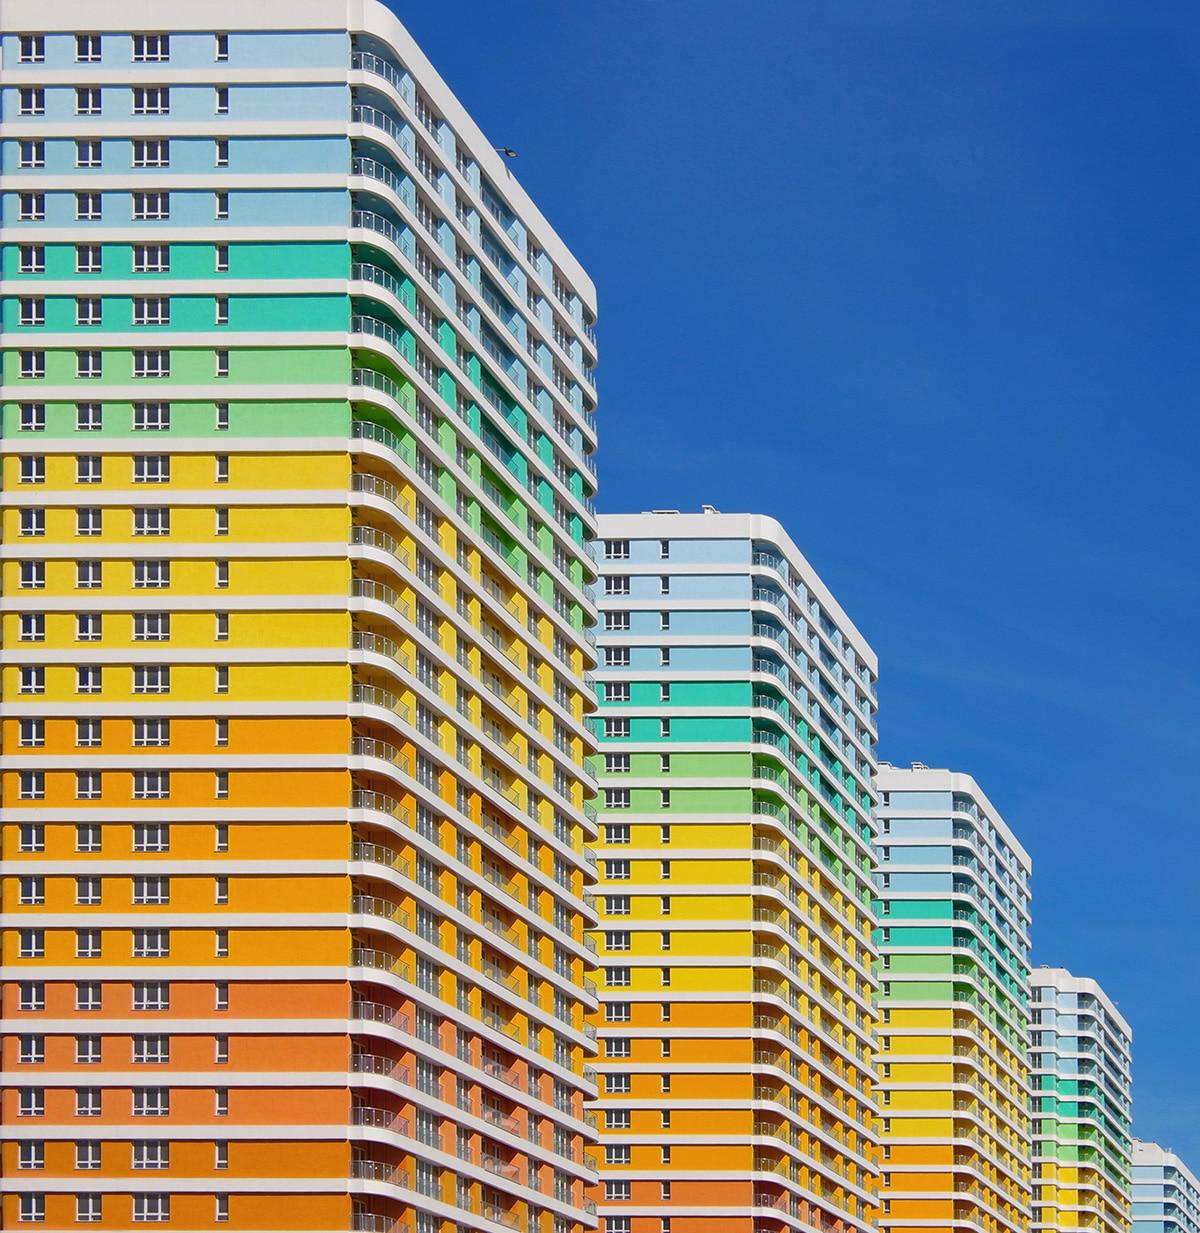 Yener Torun arquitectura colorida